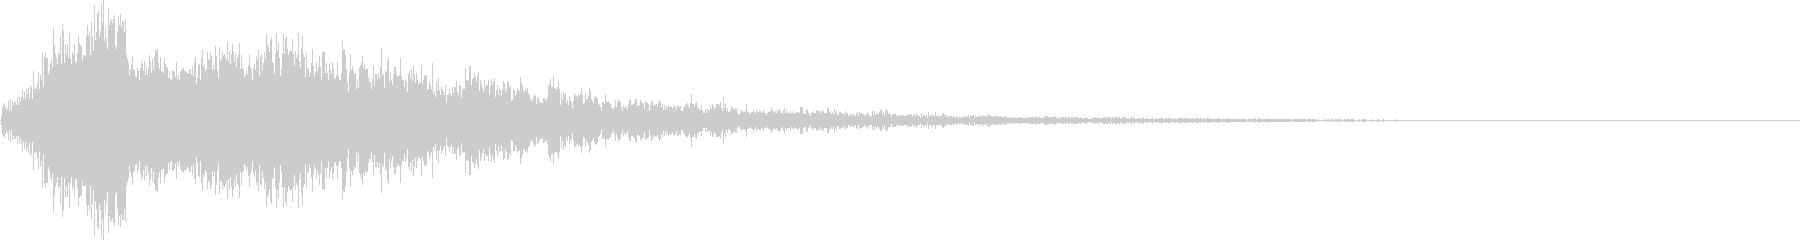 SciFi EC01_92_6の未再生の波形